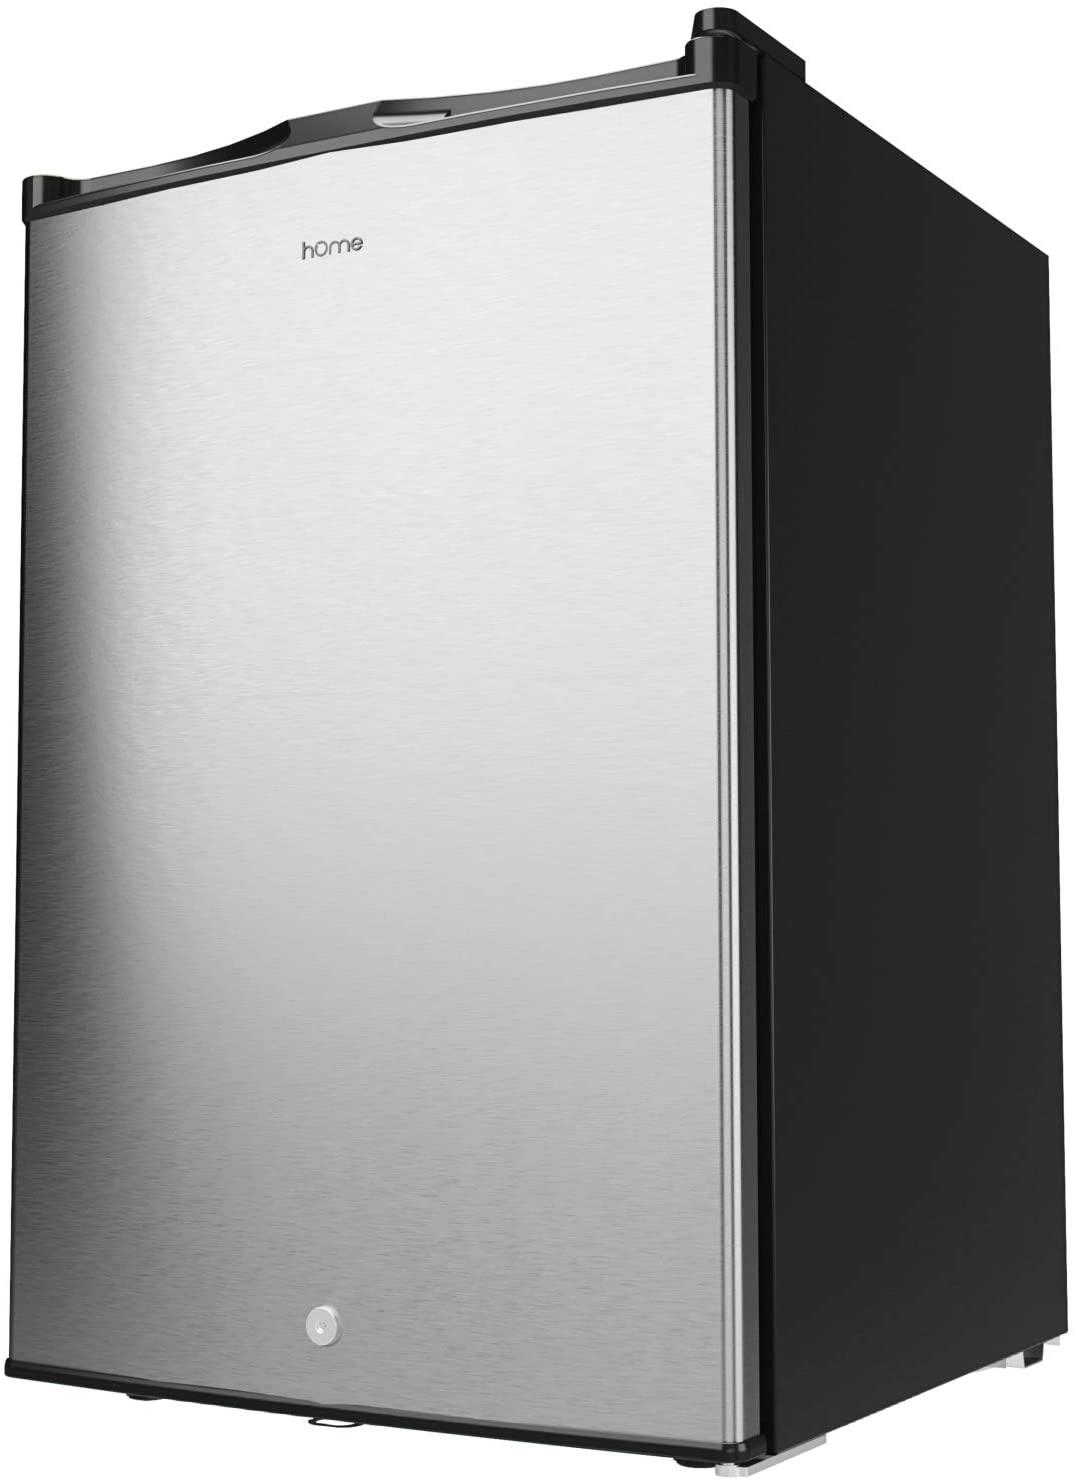 hOmelabs Upright Freezer 3.0 Cu. Ft.